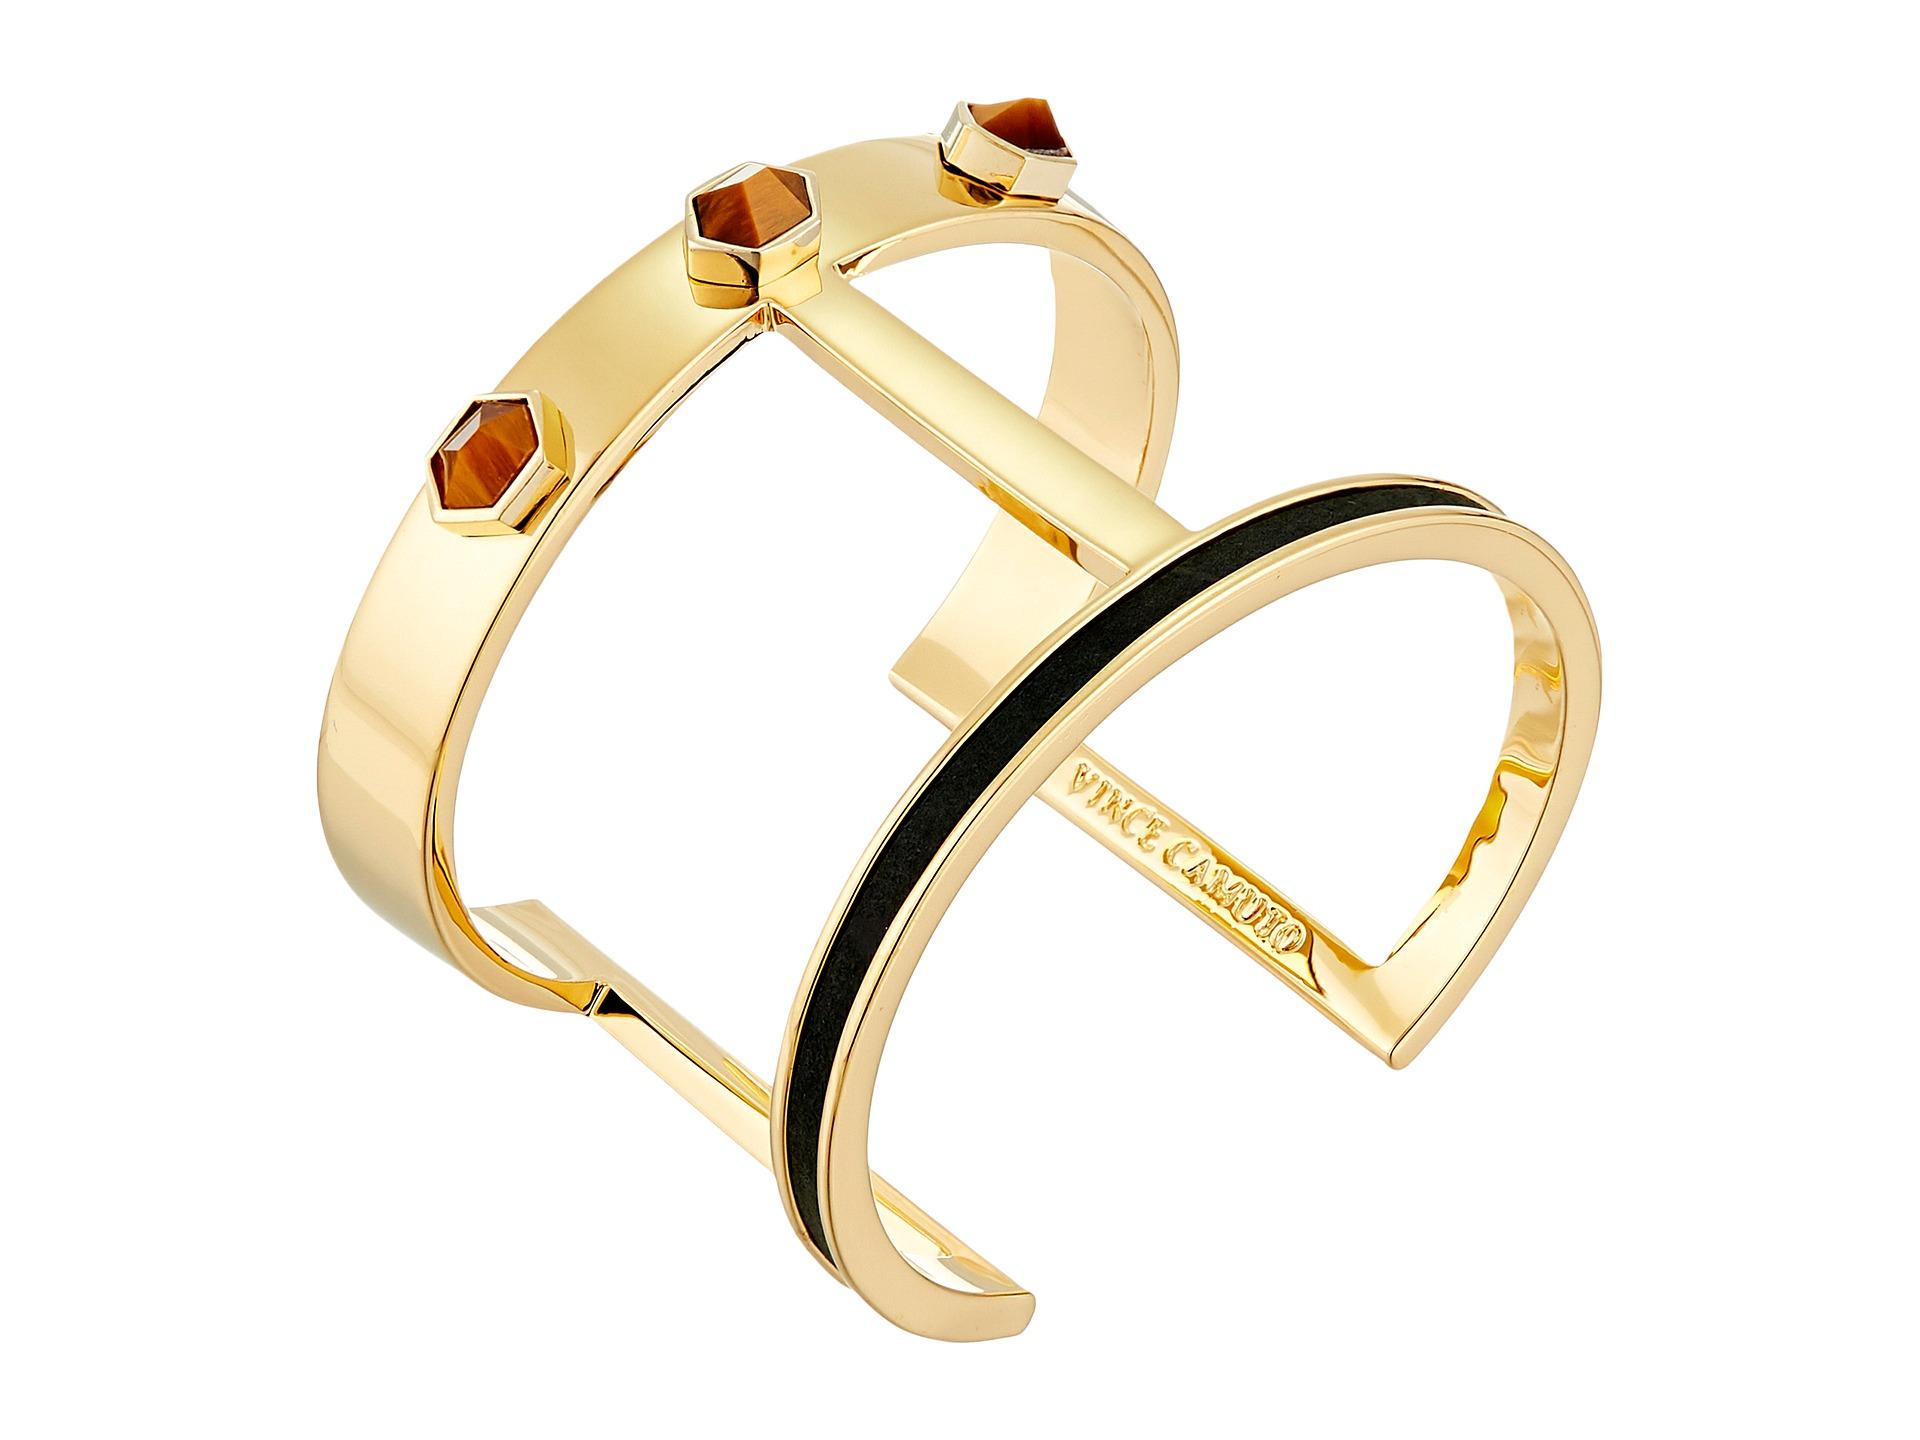 fd834493696 Vince Camuto Stone & Leather T Bar Cuff Bracelet in Metallic - Lyst